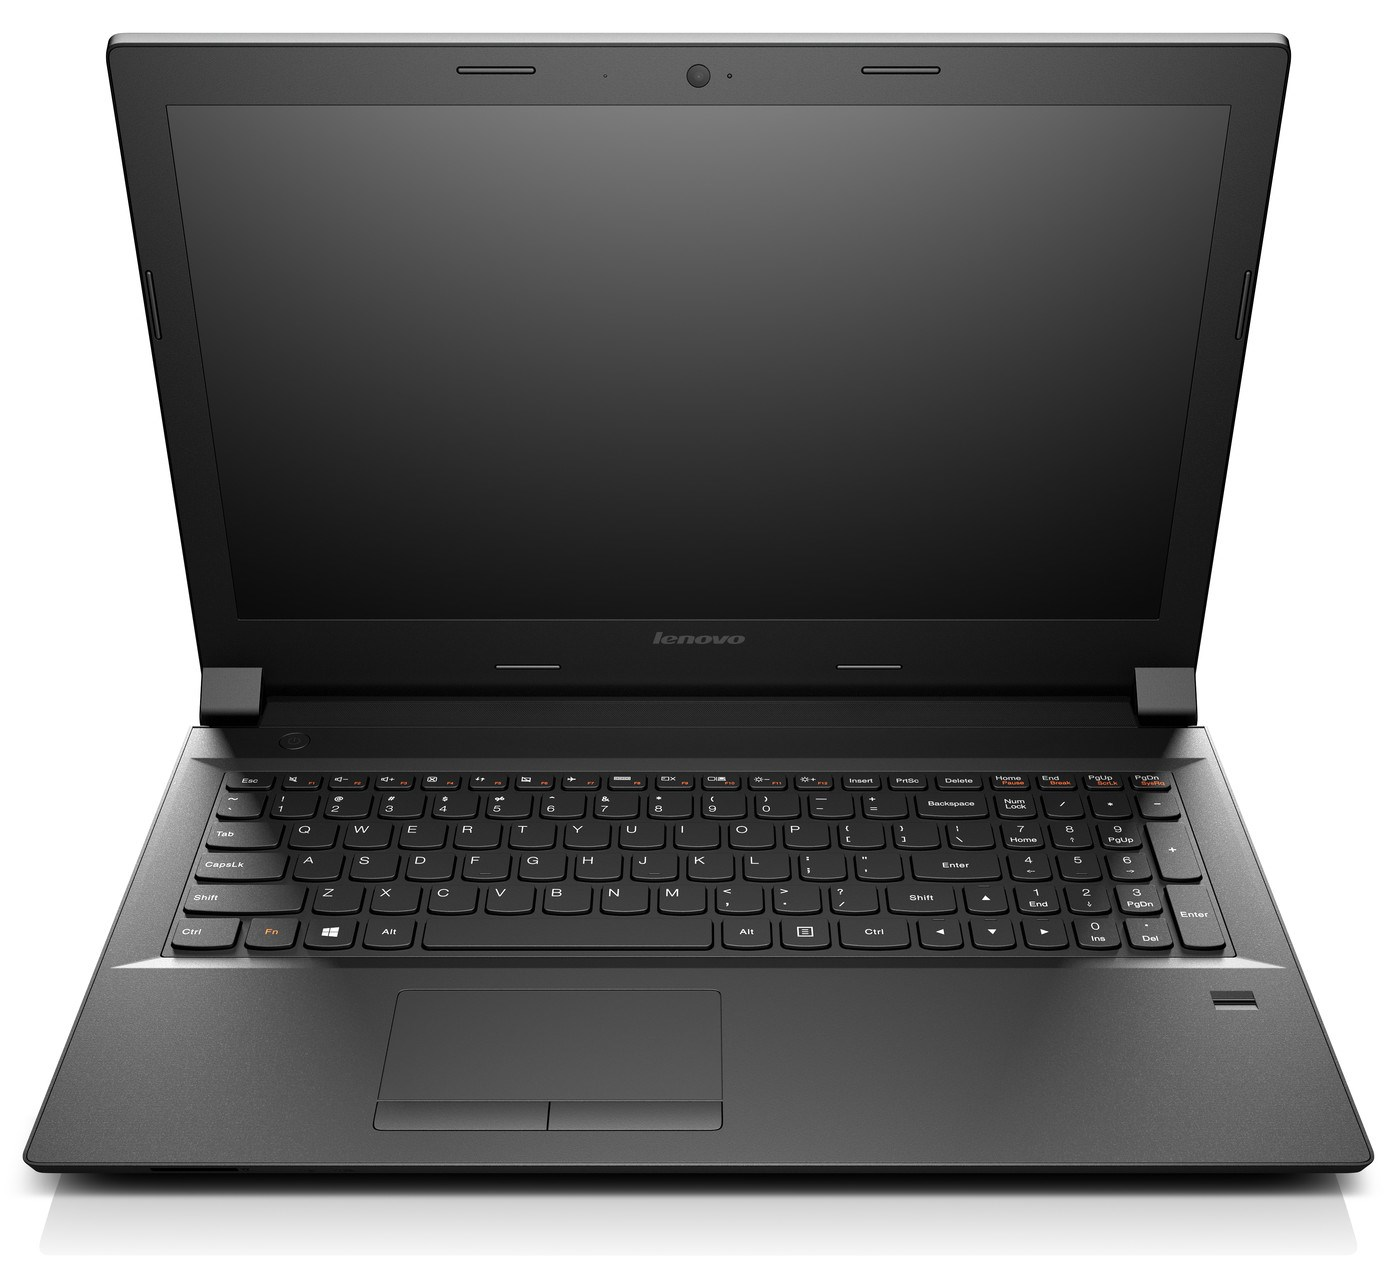 "Lenovo B50-50 15.6"" HD/3825U/1TB/4GB/HD/DVD/F/Win 10 Home"